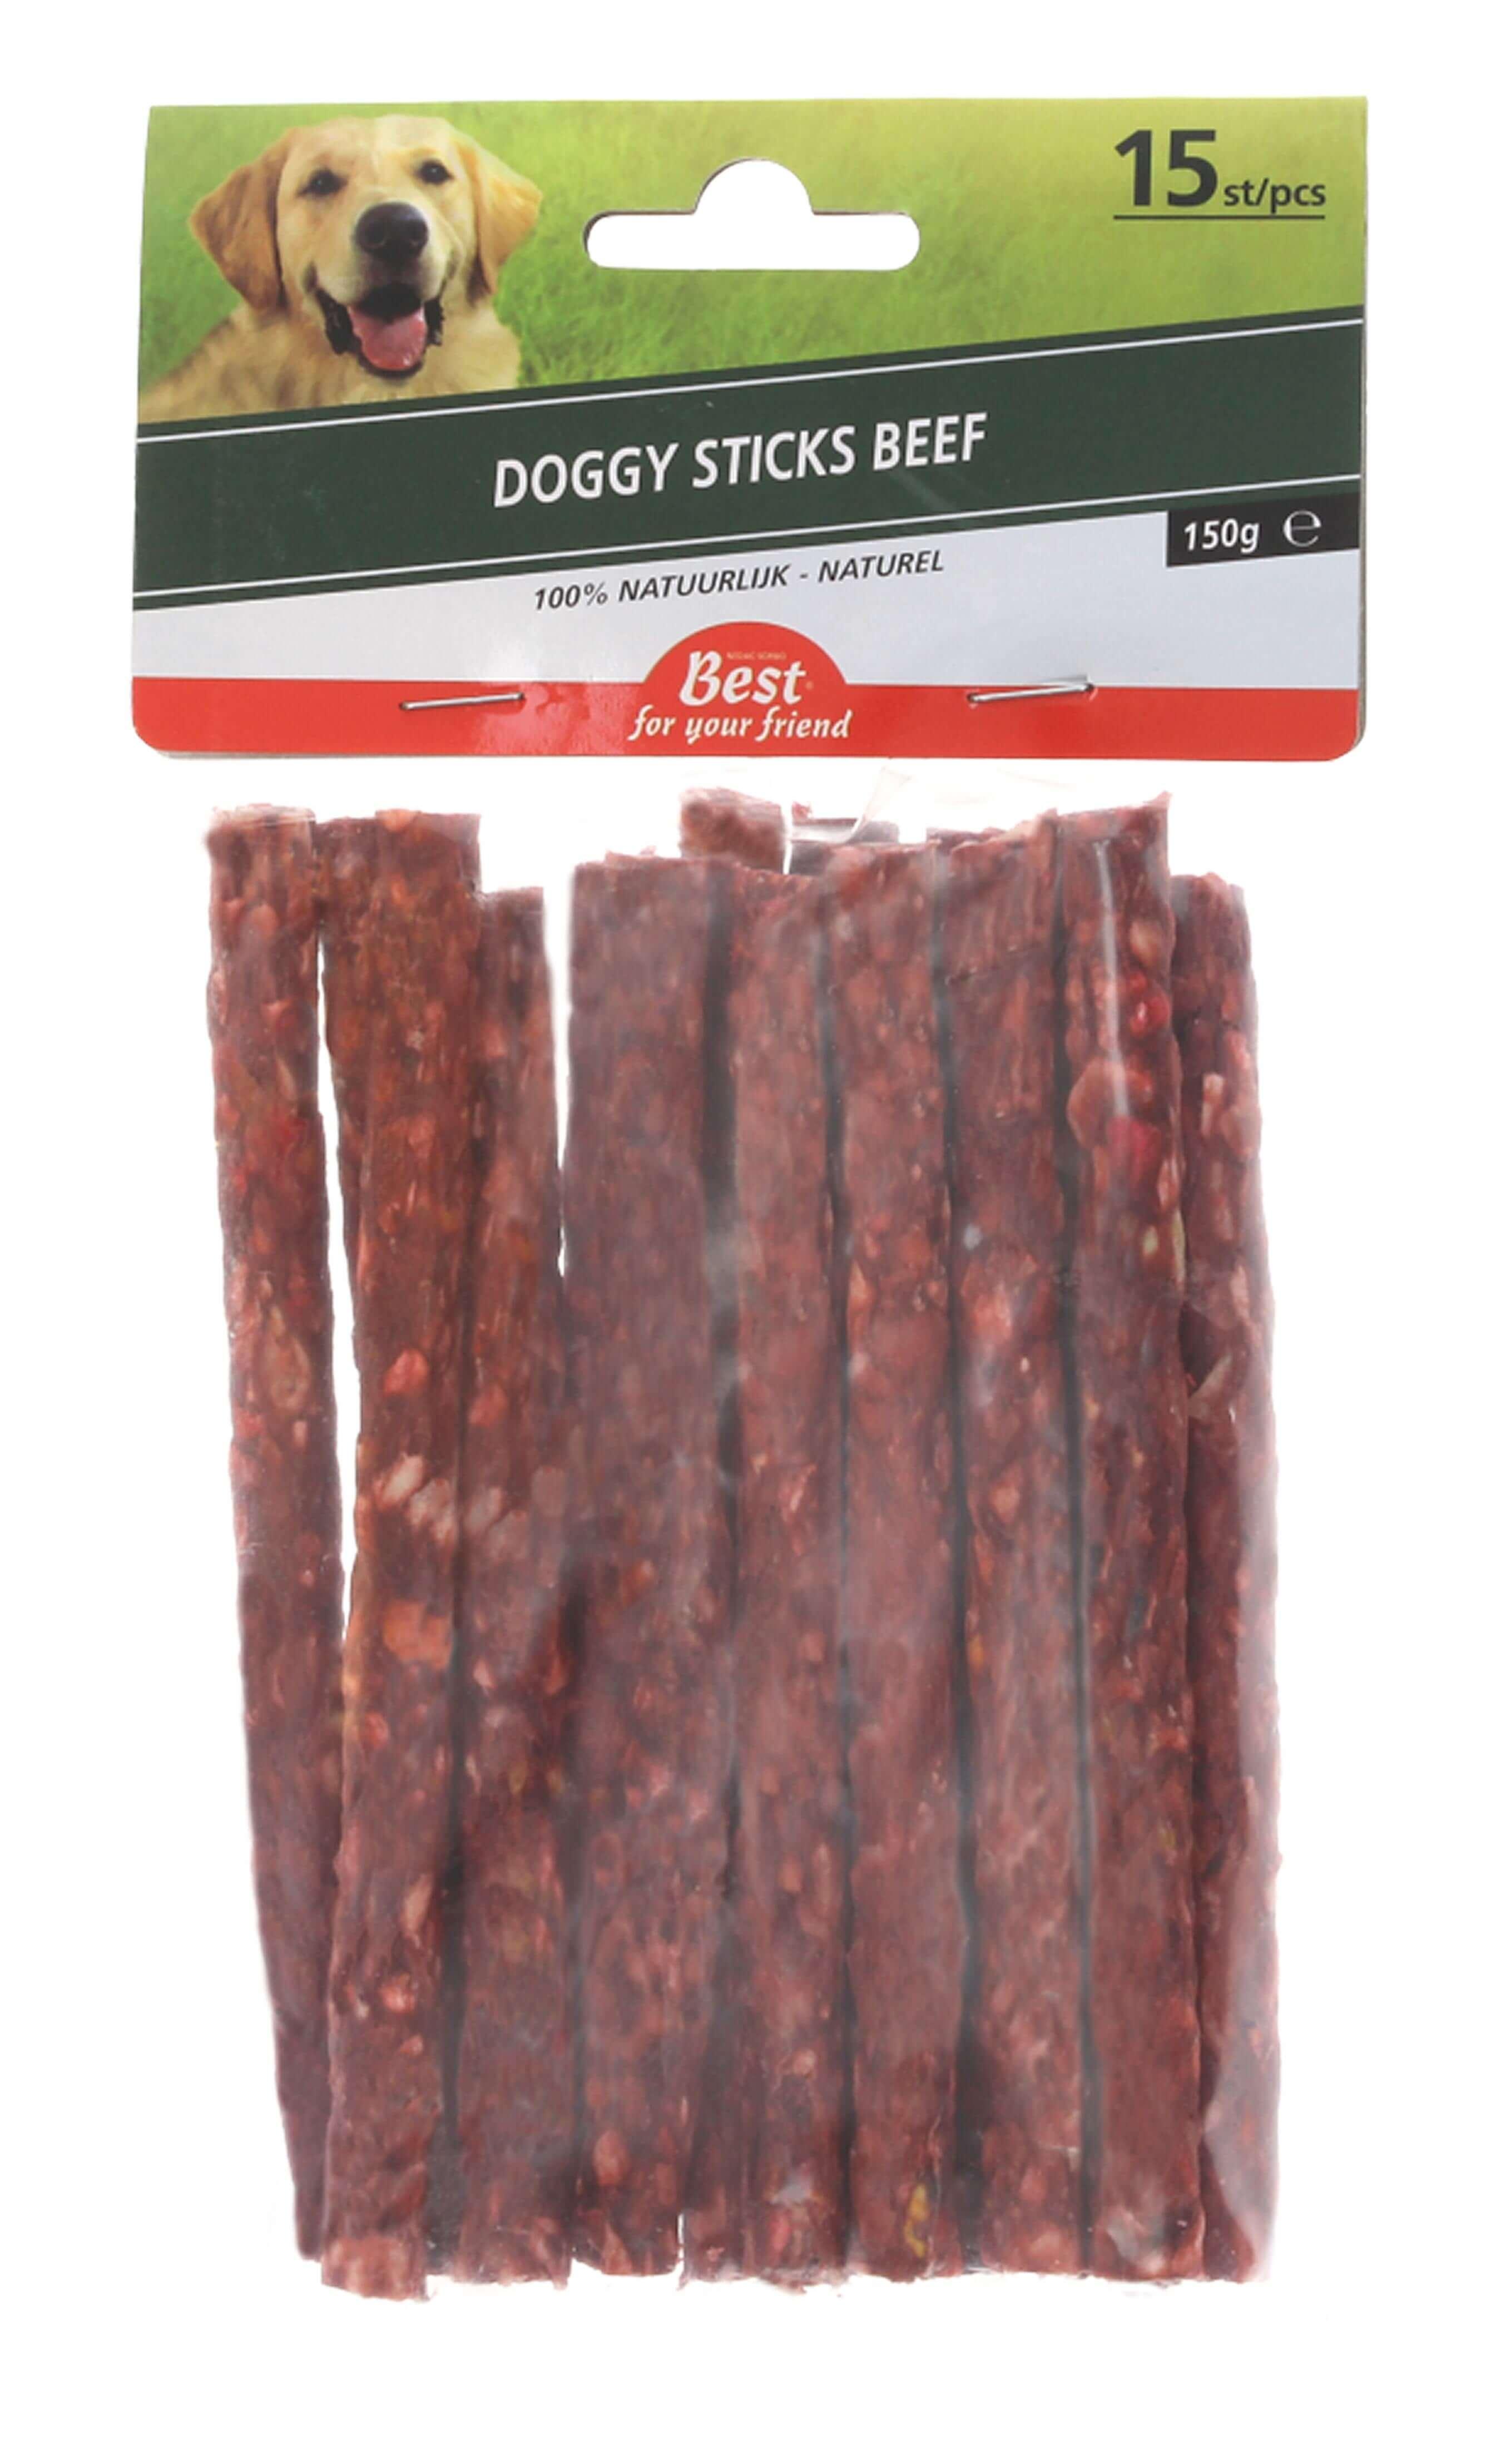 Doggy sticks met rund 15 stuks